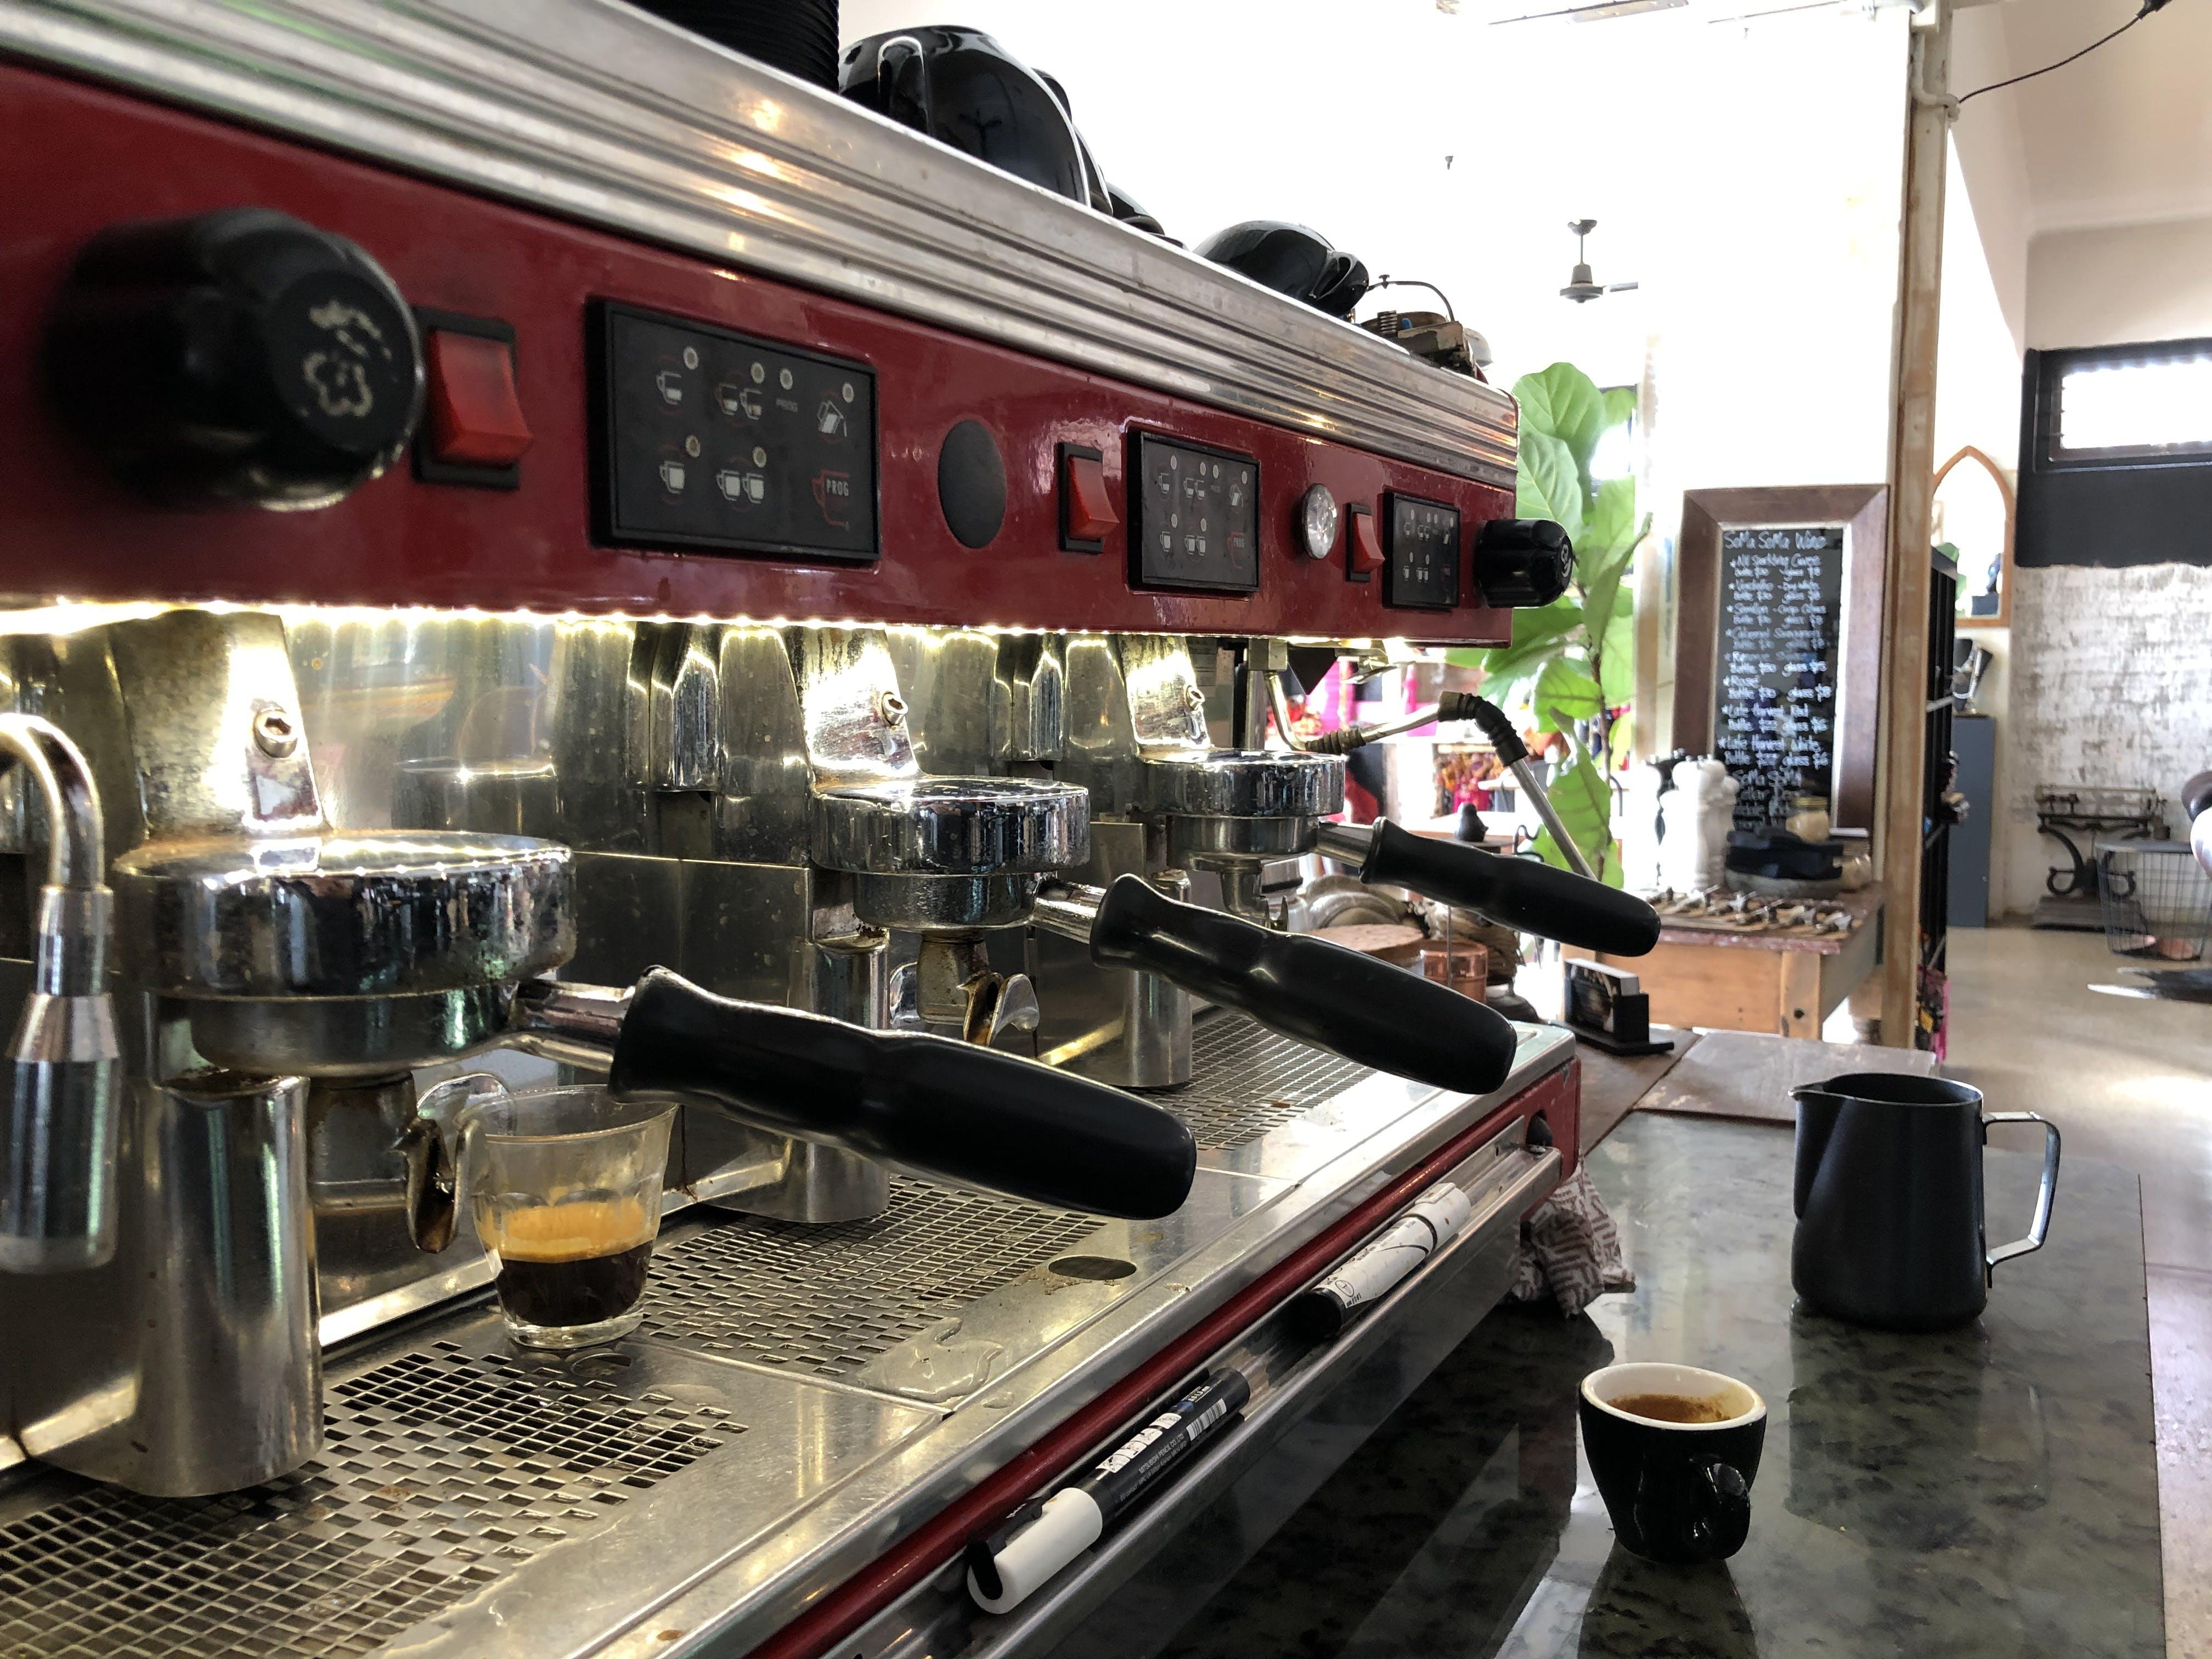 SoMa SoMa, multi-use area at SoMa SoMa Espresso, image 5